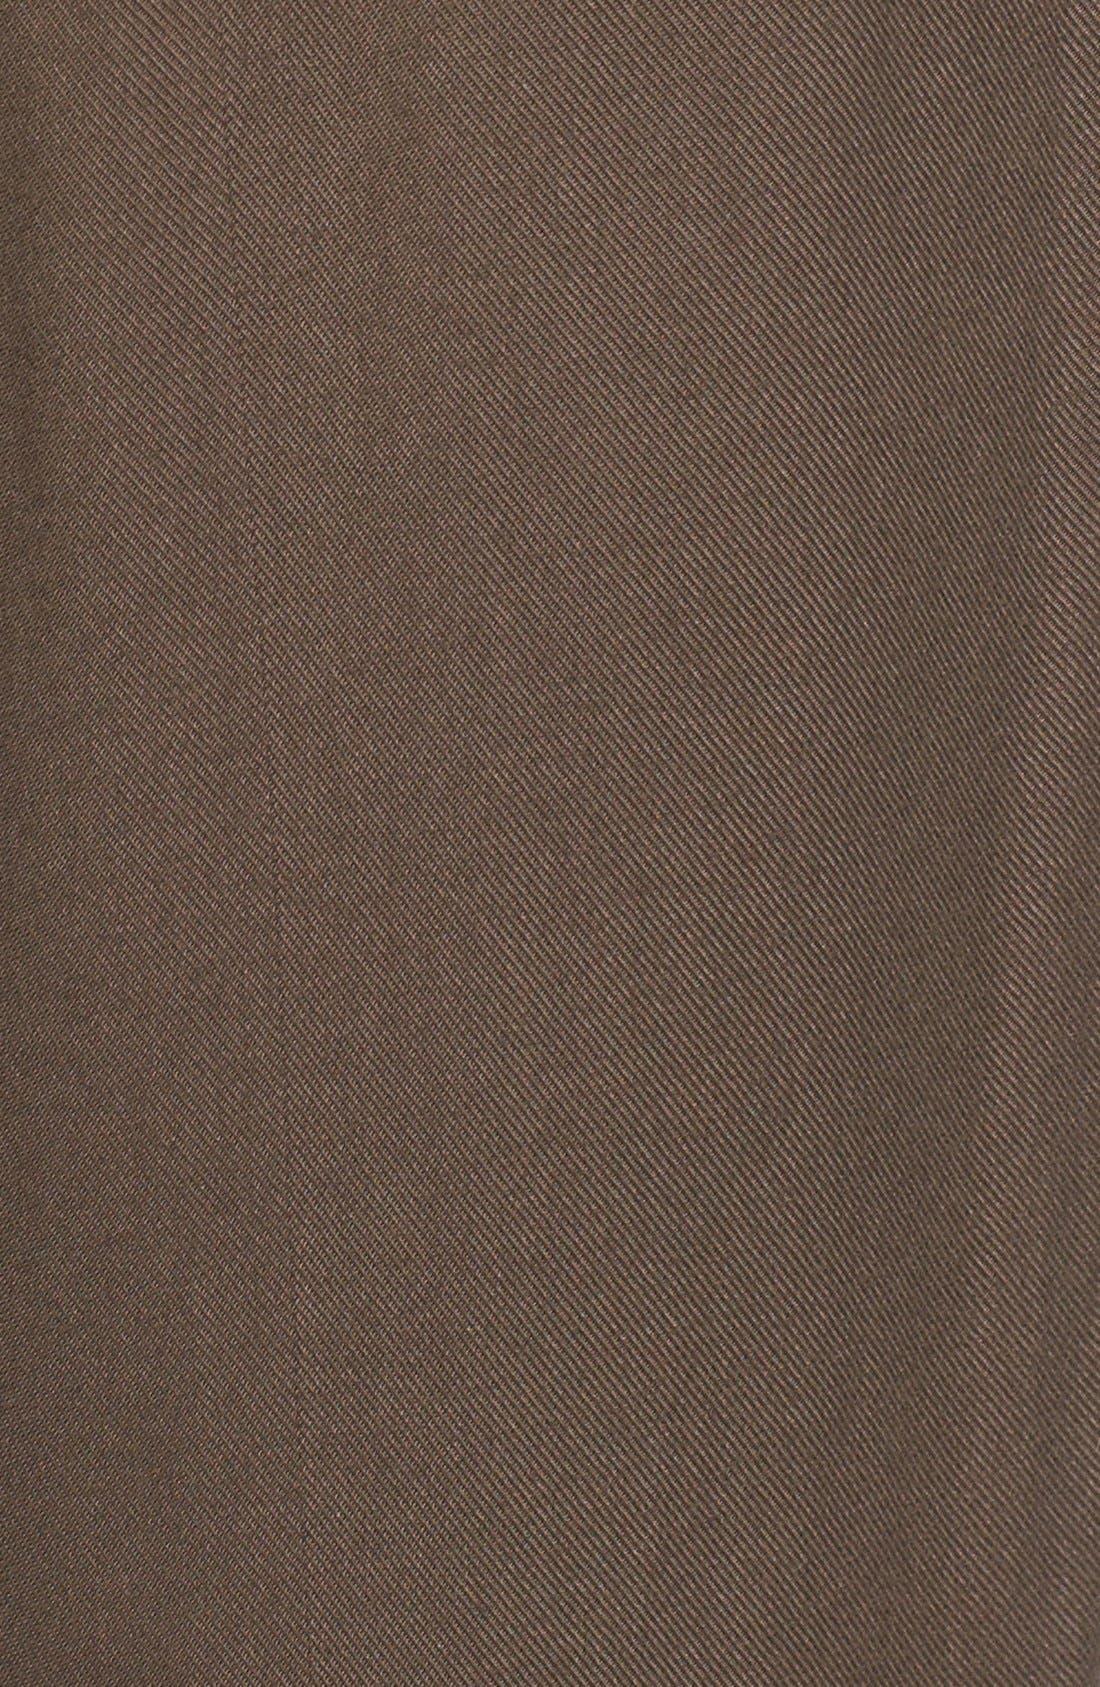 Alternate Image 3  - Jolt Drawstring Woven Pants (Juniors)